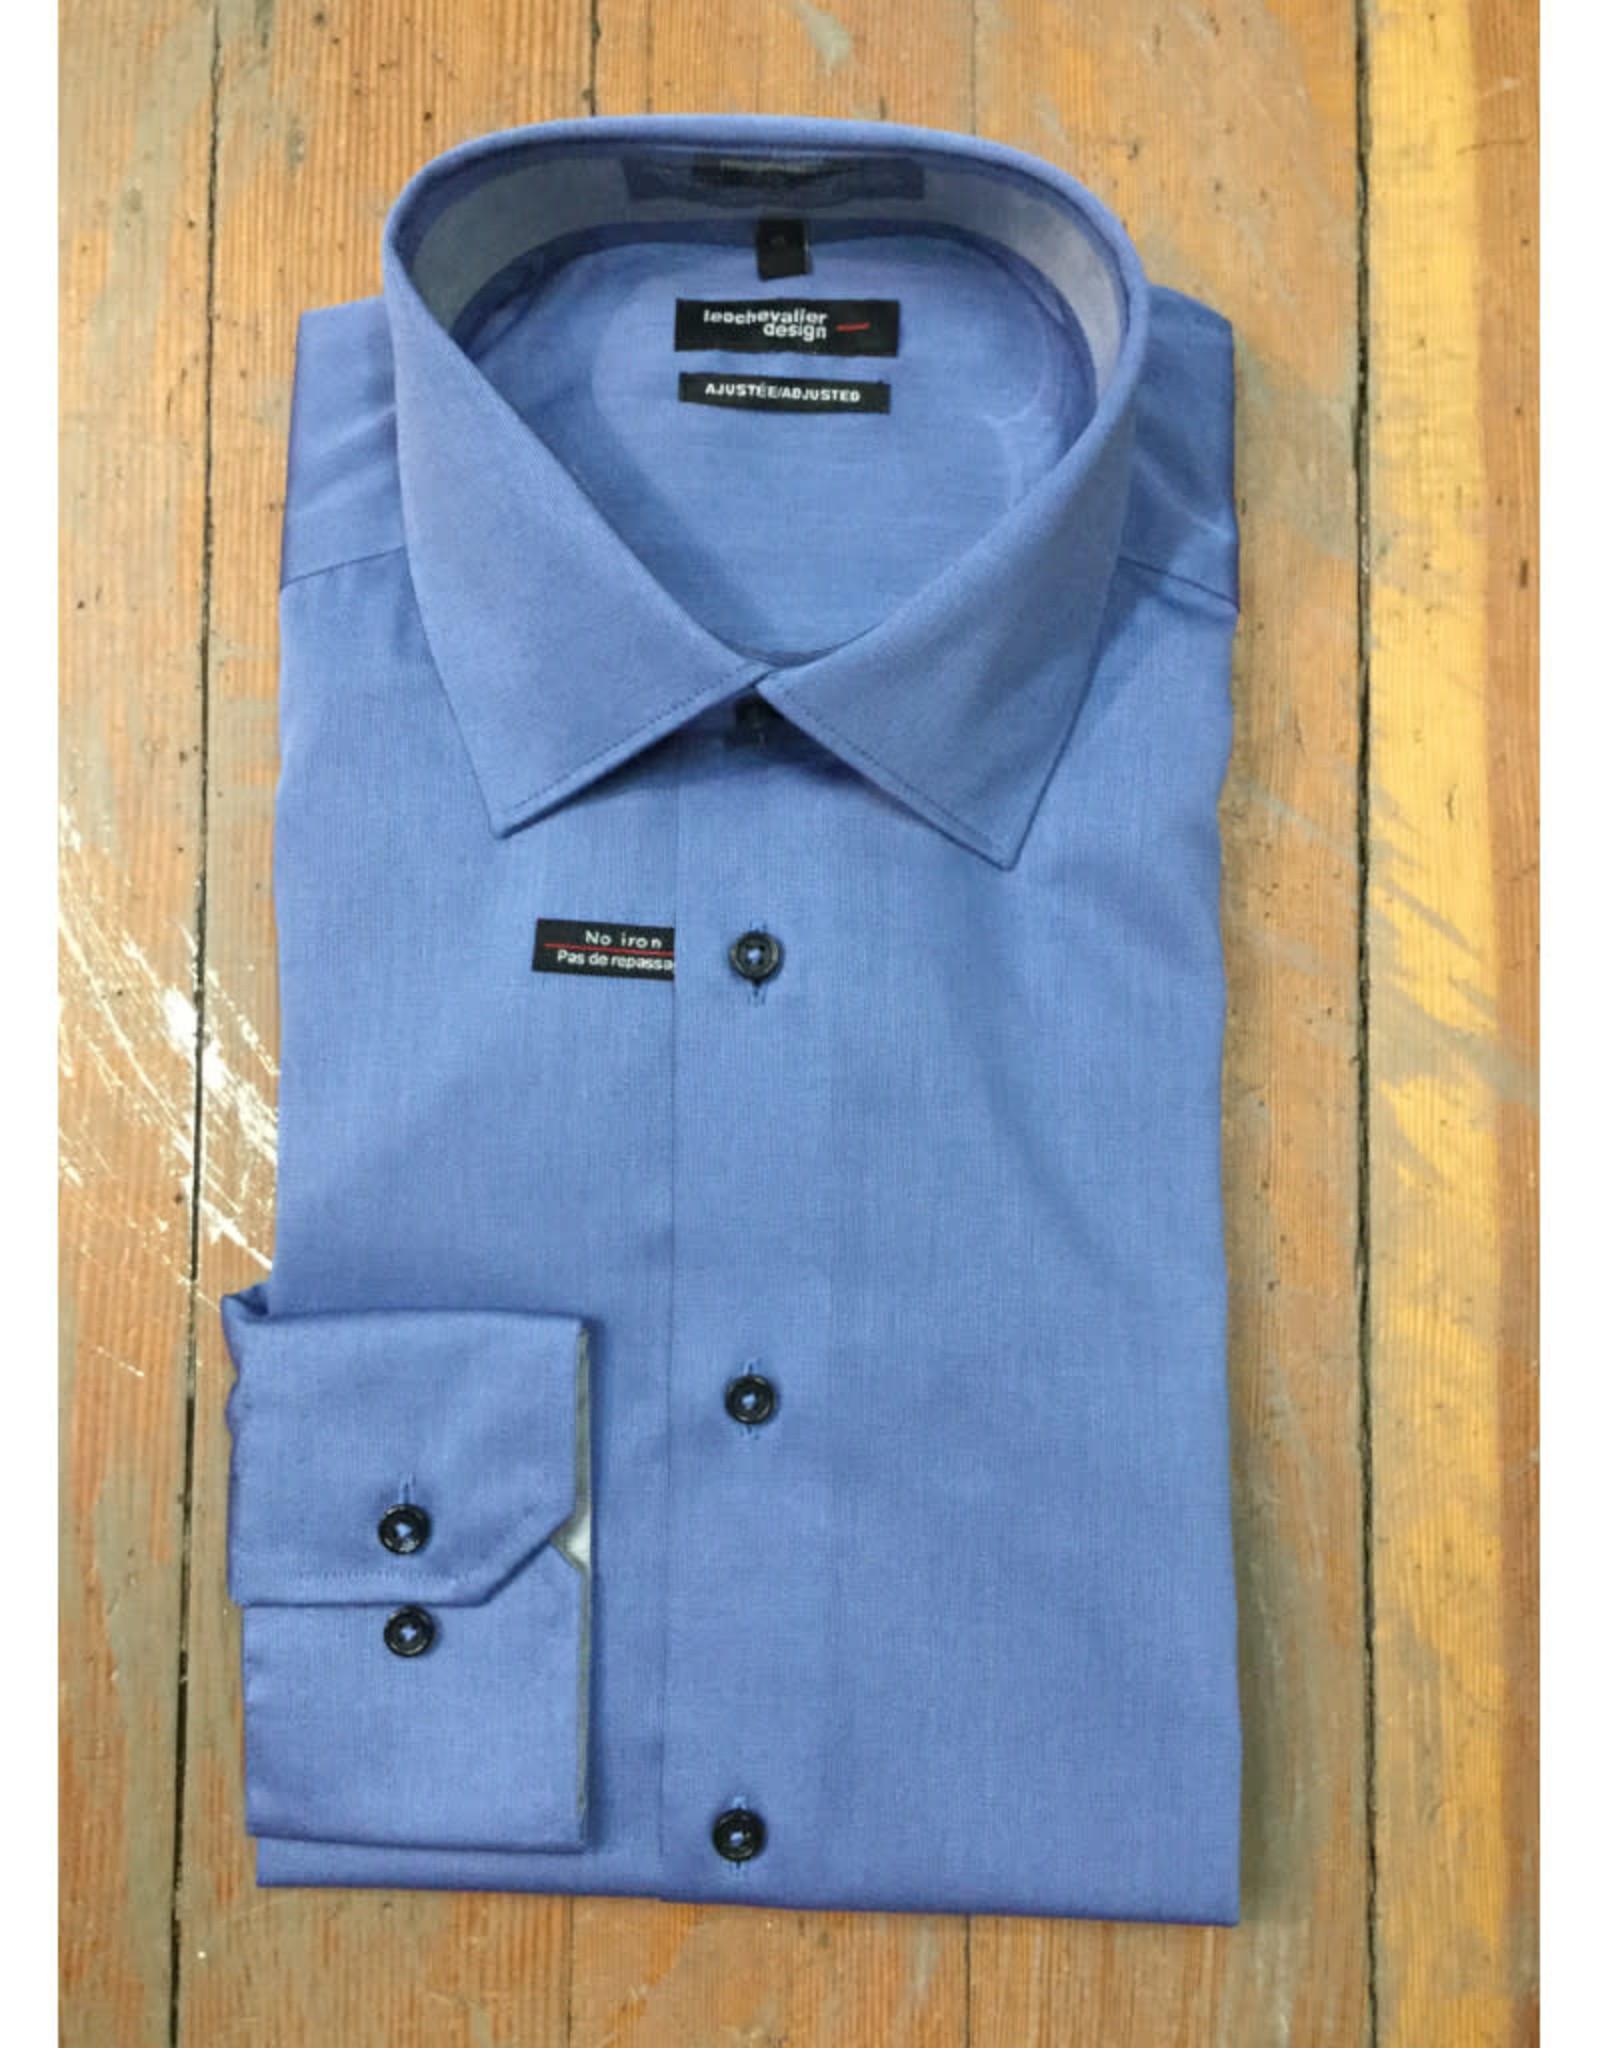 Leo Chevalier Leo Chevalier 100% Cotton Slim Fit Dress Shirt.